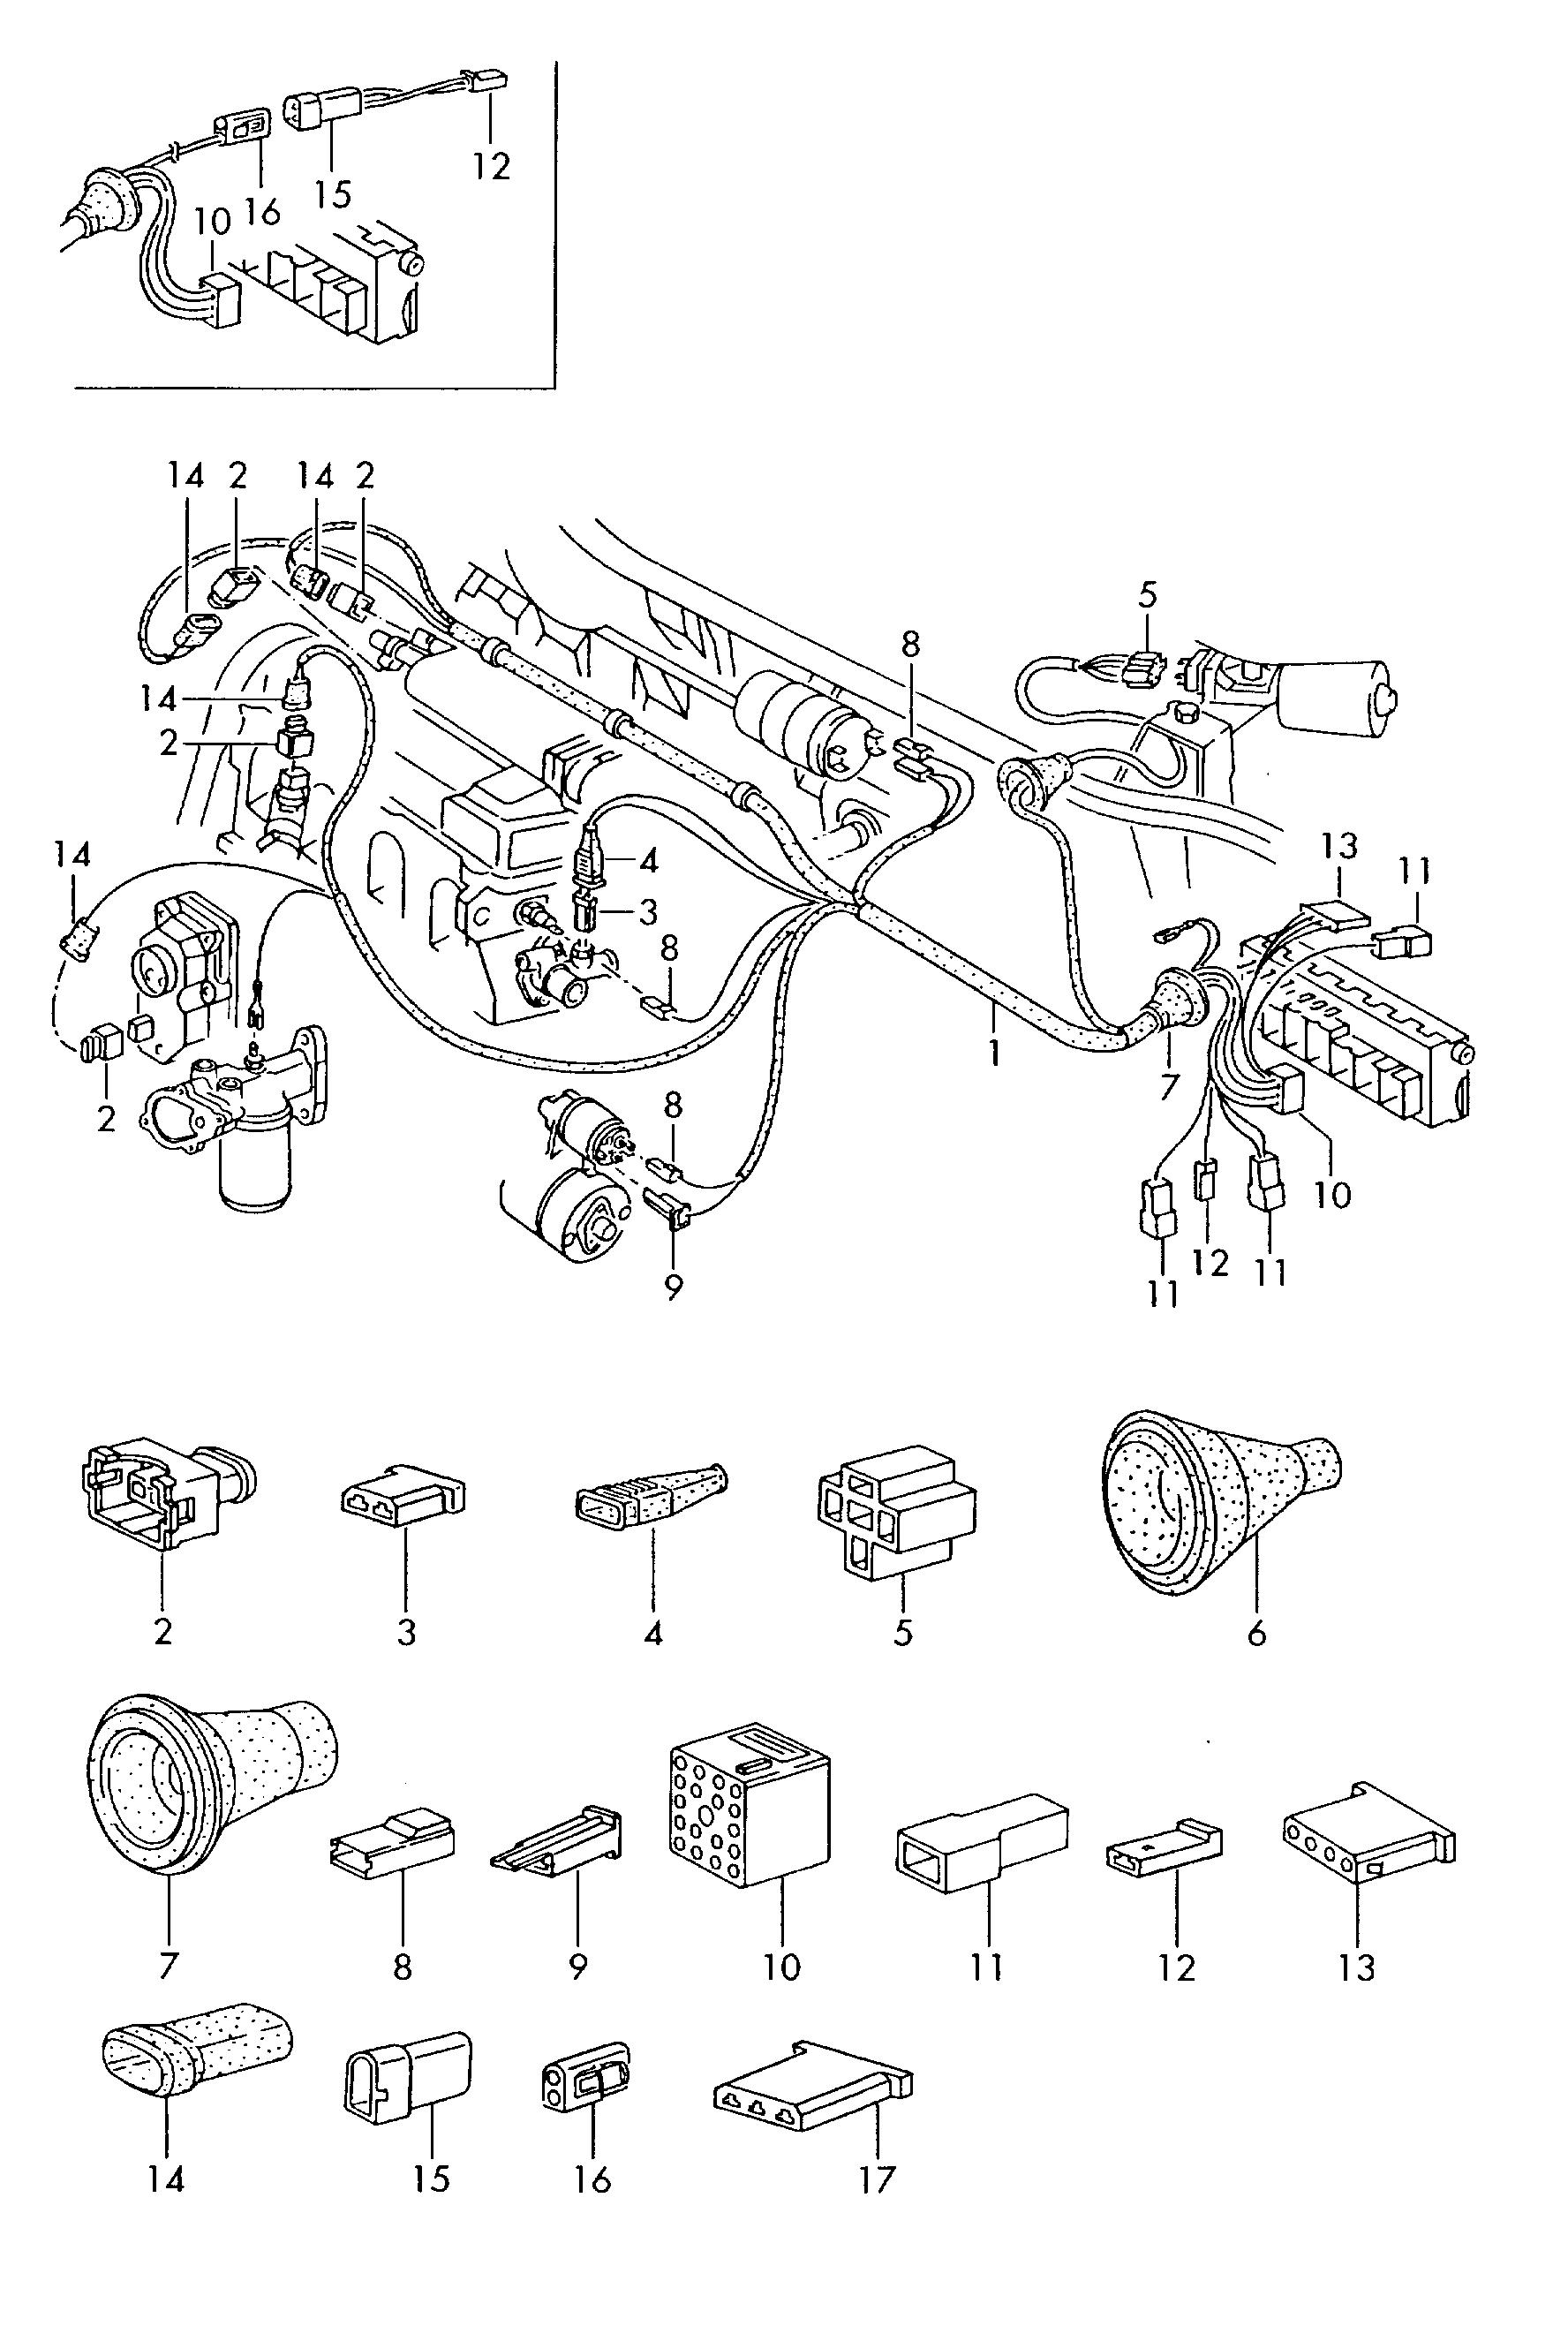 1979 Vw Wiring Harness Schematic Diagram Bushtec Volkswagen Golf Cabriolet 1980 Front